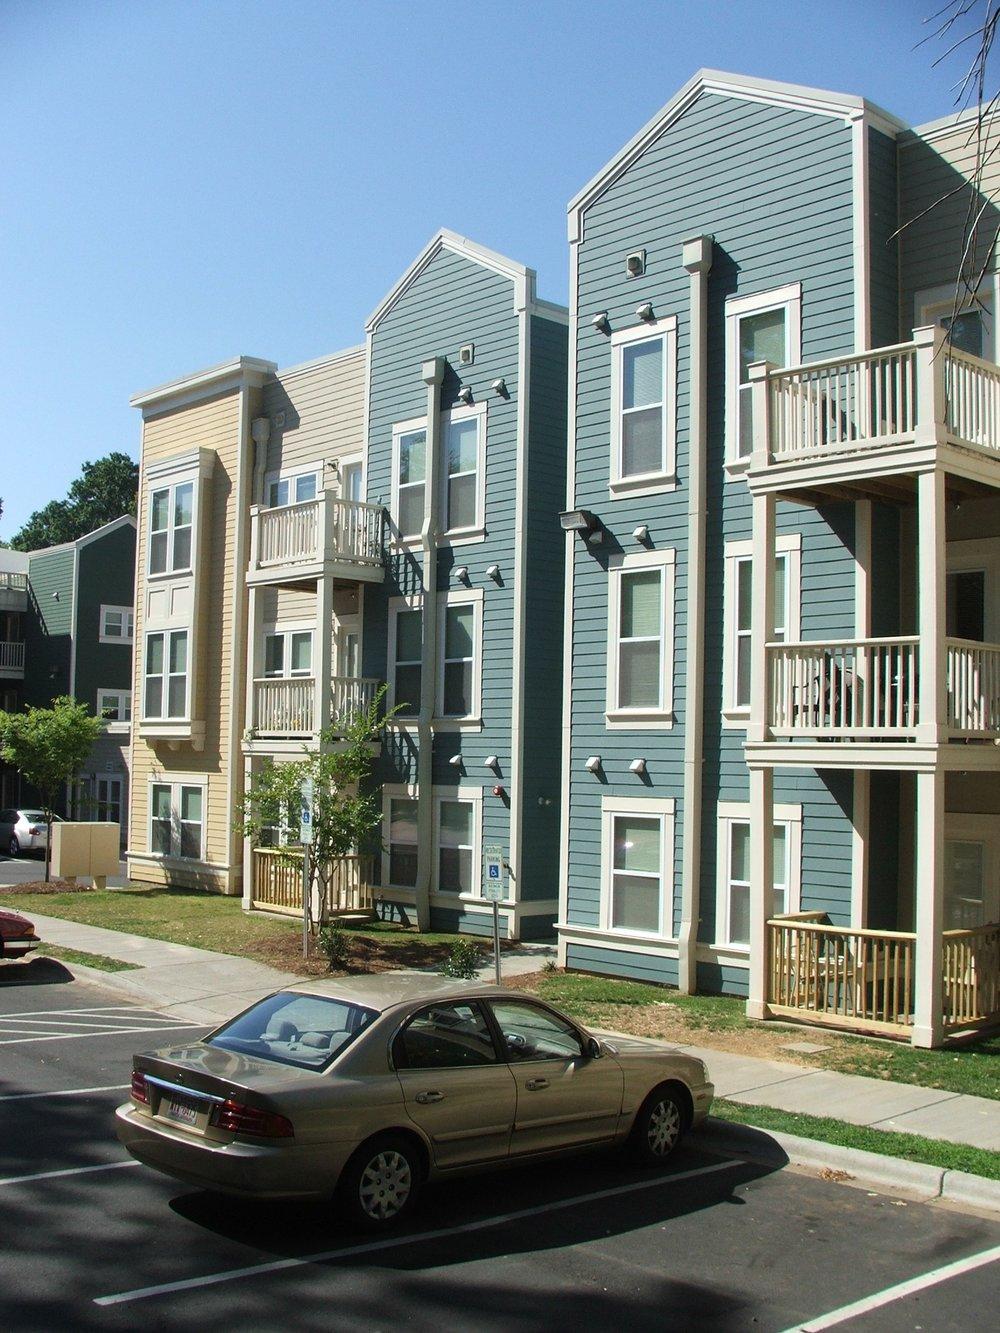 08.07.01CHA-McAden Apartments 040.jpg